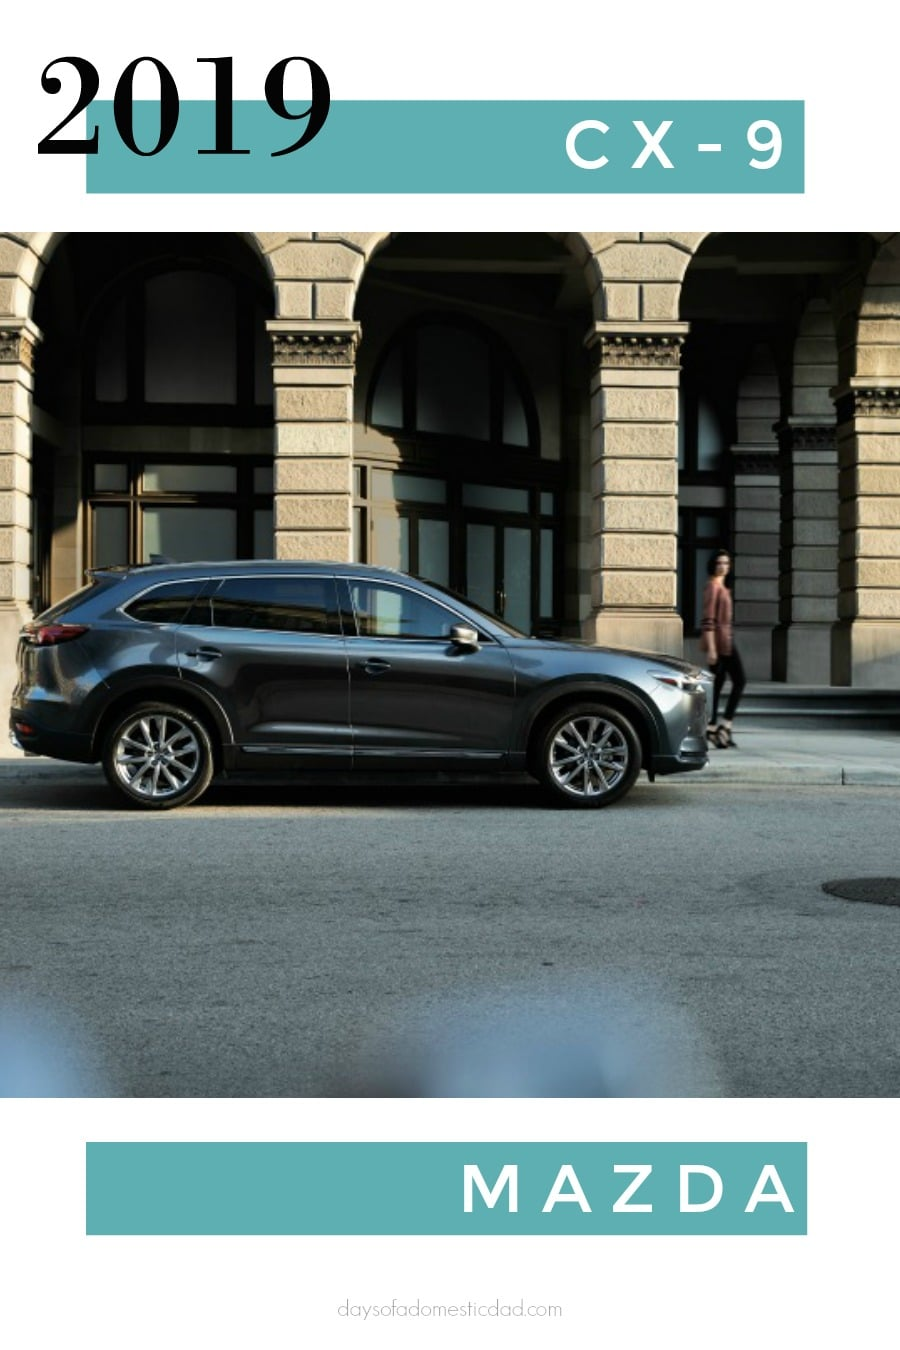 Second-Generation Mazda CX-9 Midsize Crossover is a Win